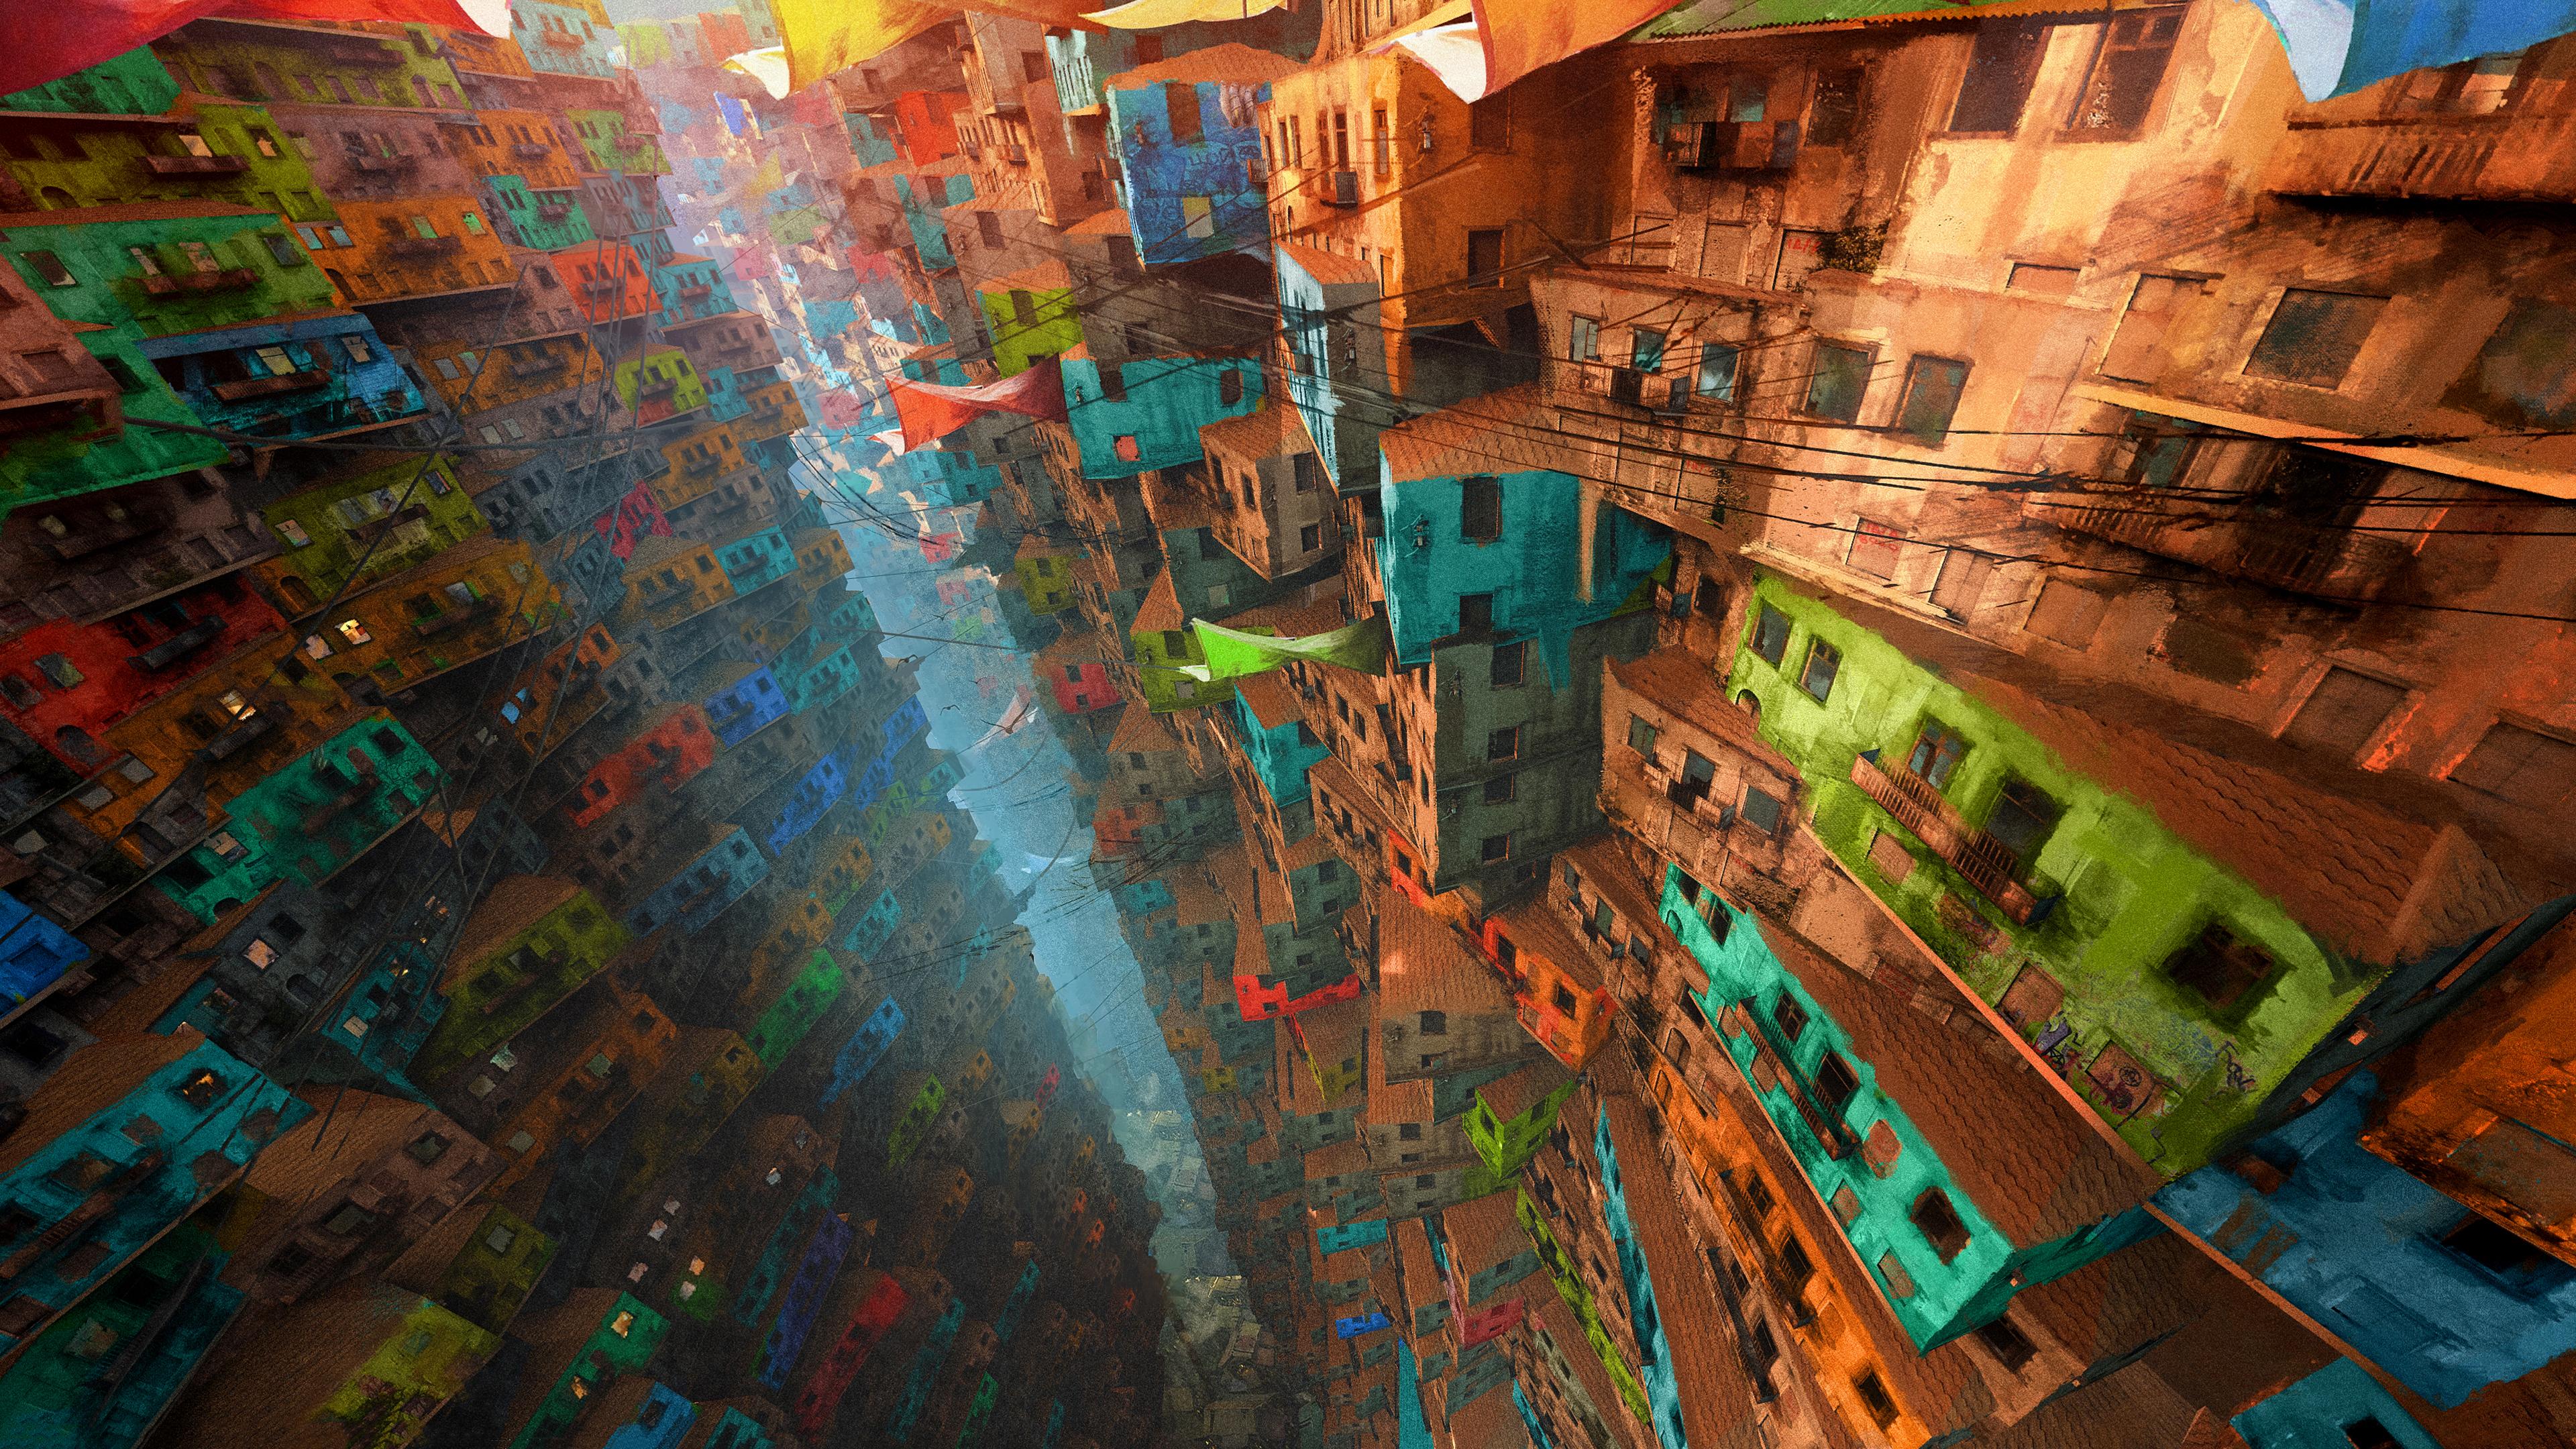 General 3840x2160 digital art city house favela fantasy art niyas ck